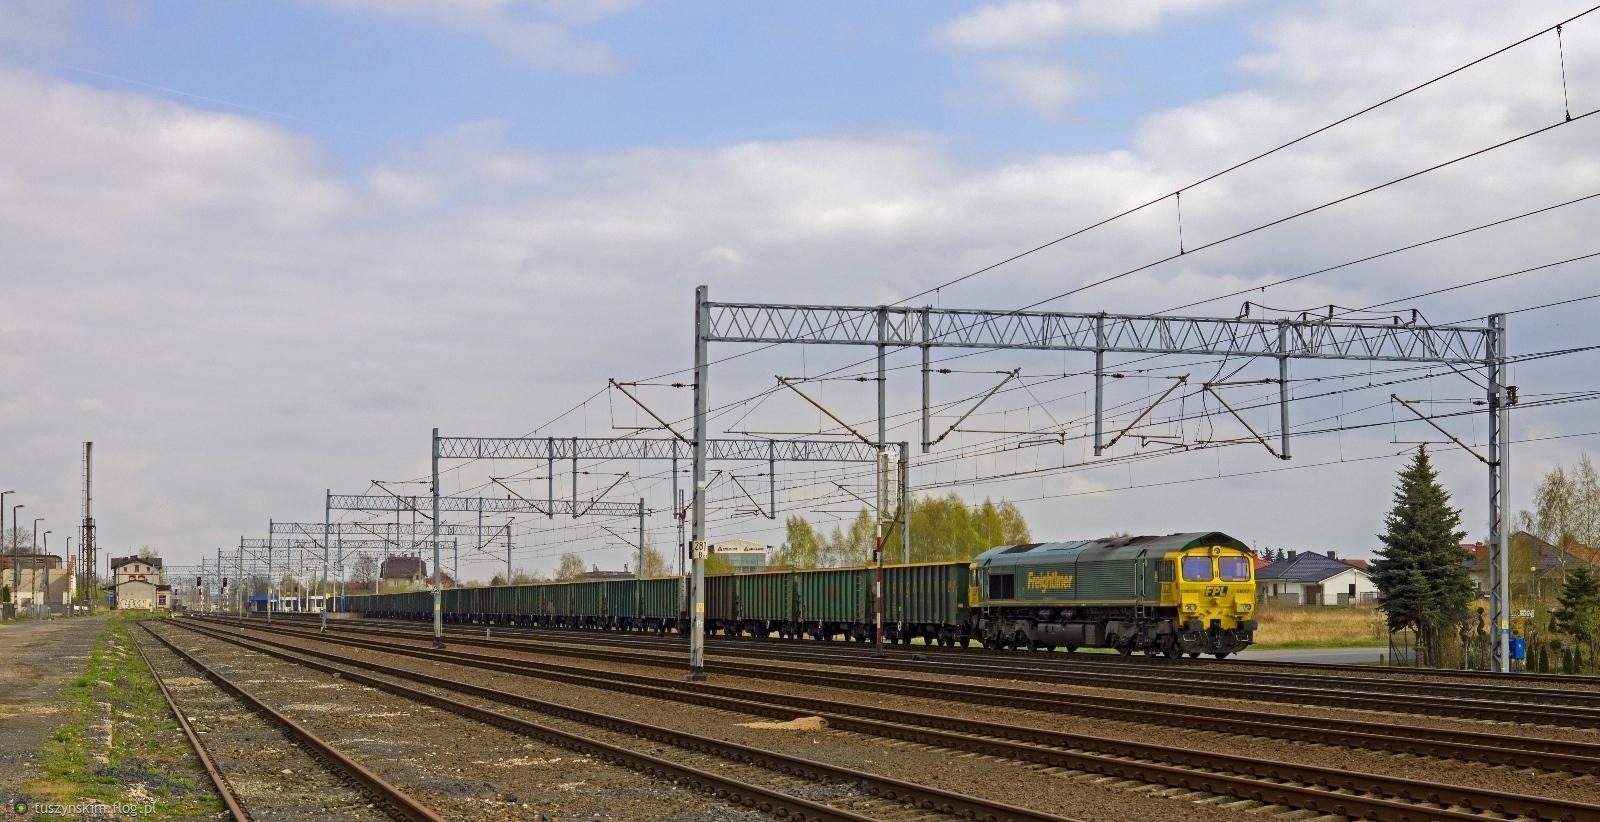 Class 66017